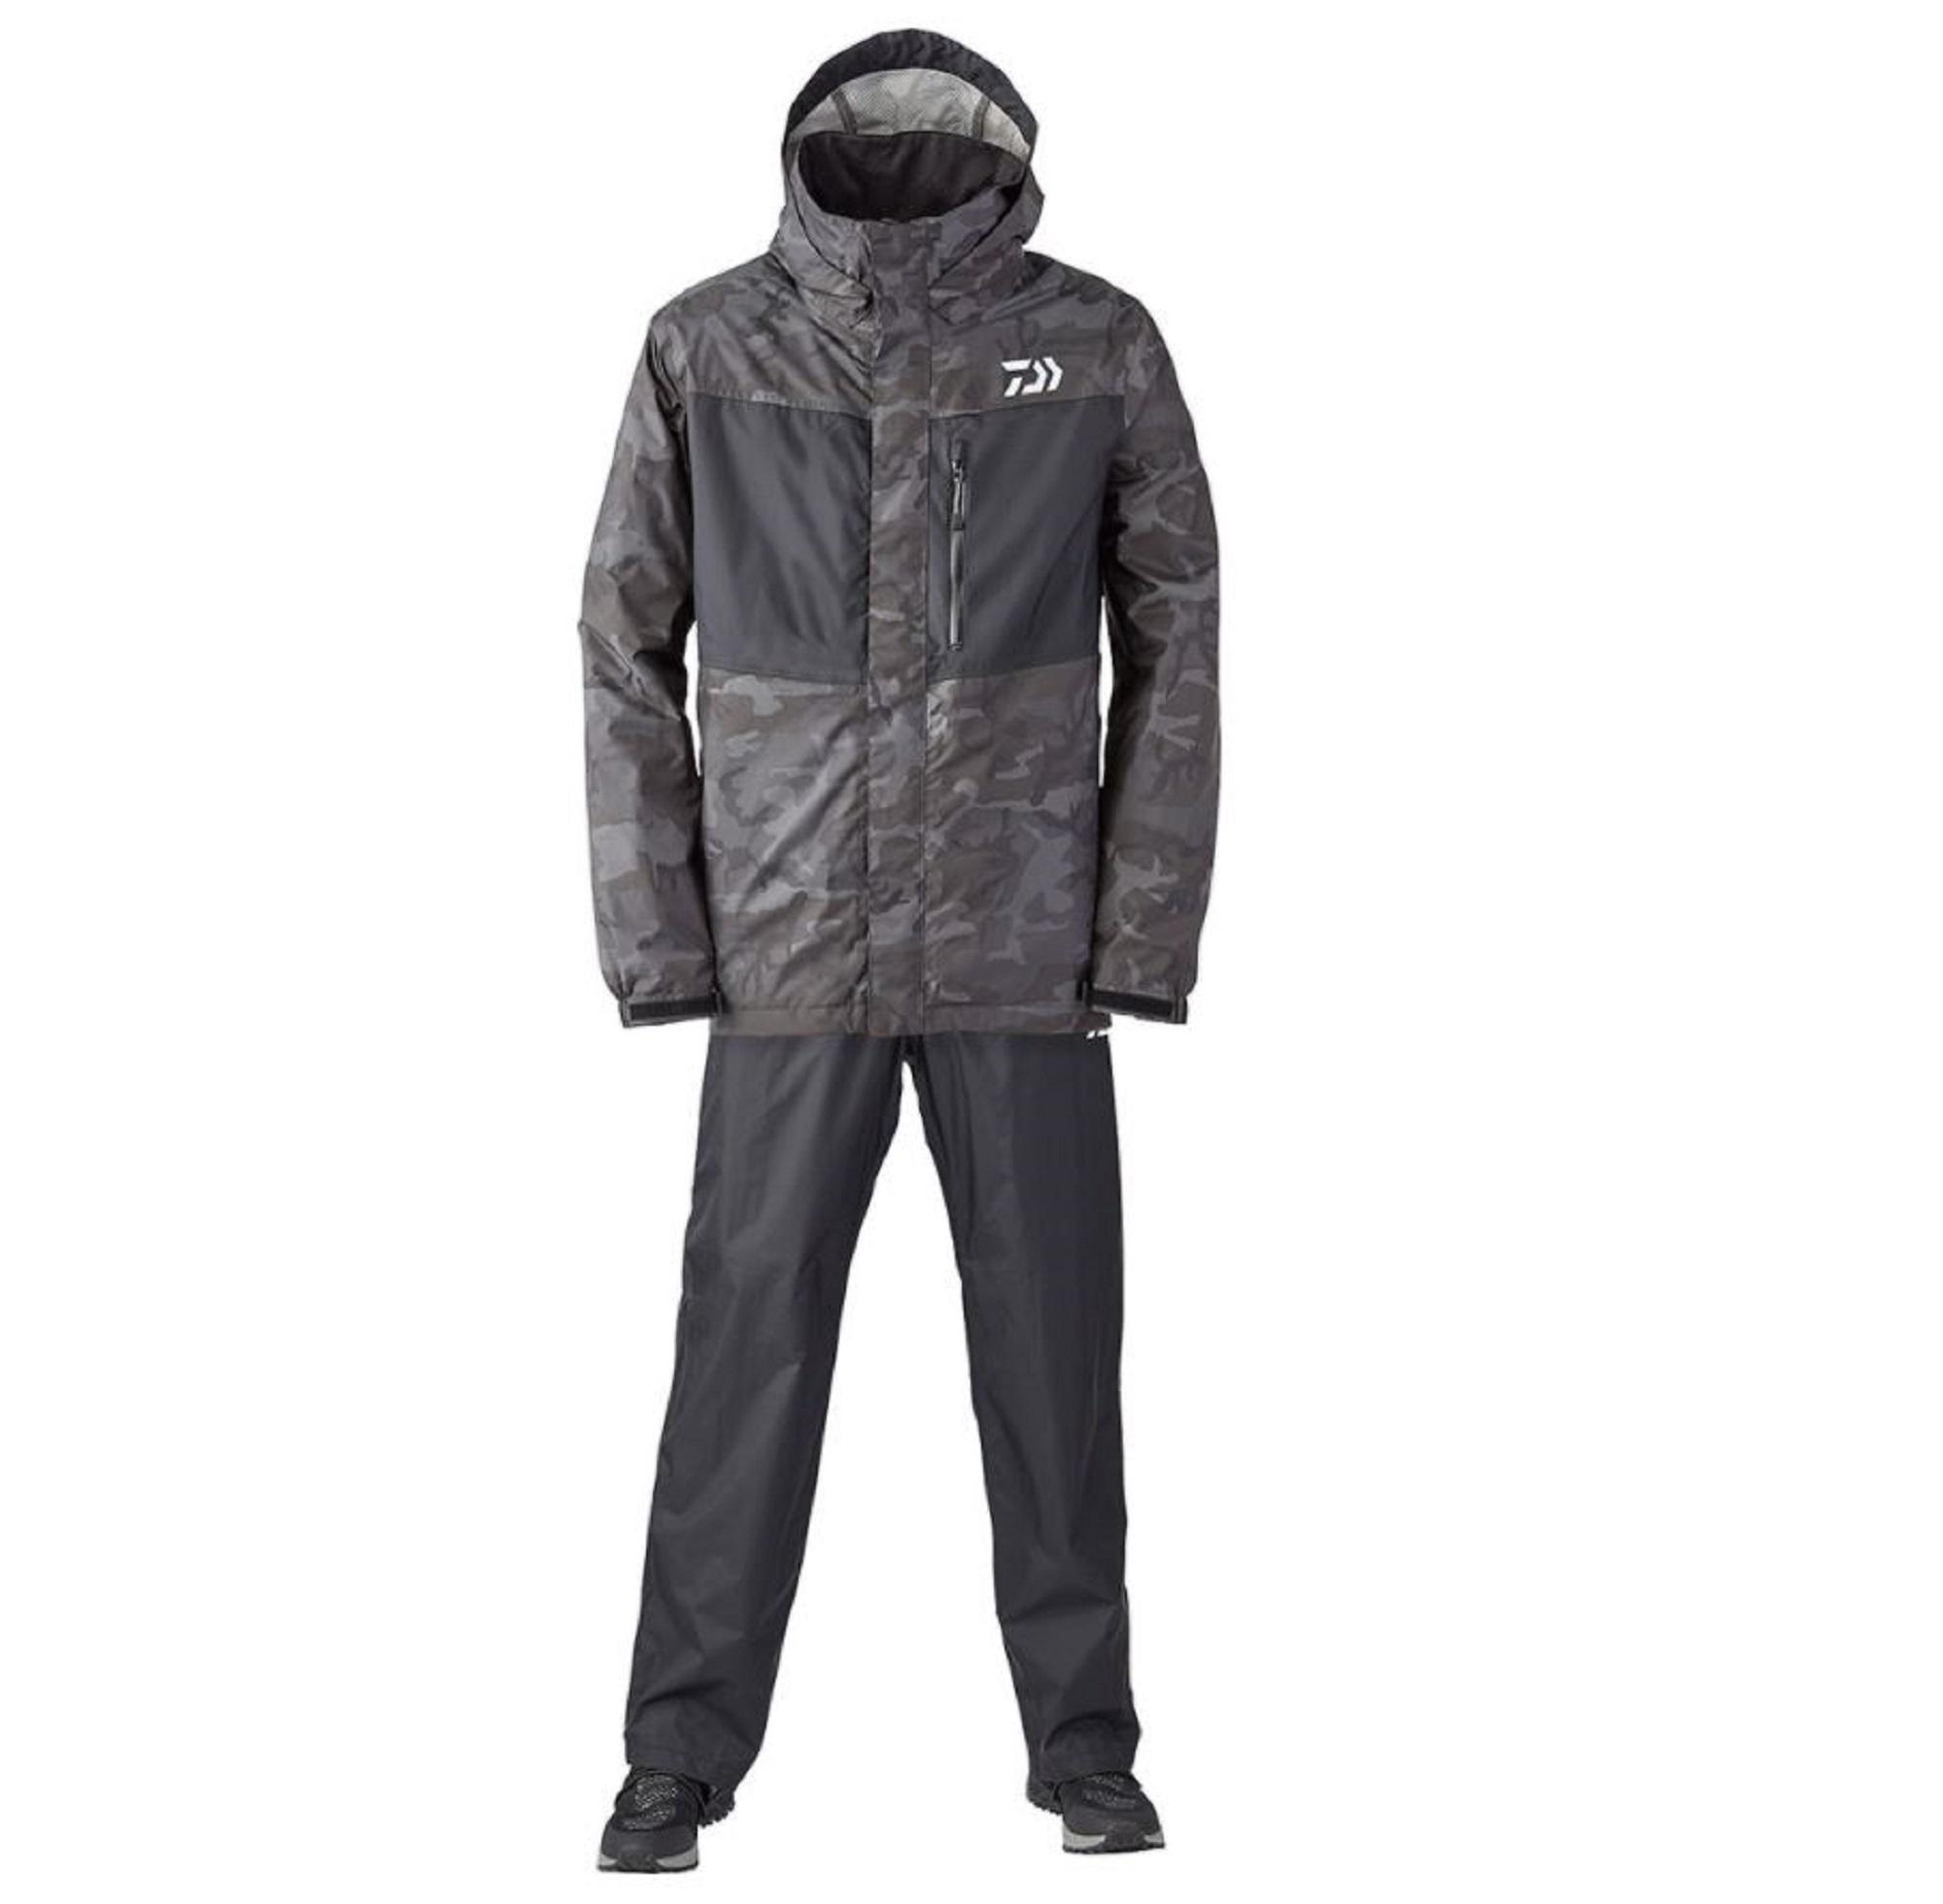 Daiwa DR-3621 Rainmax Water Repellent Jacket Size M Black Camo (6282)